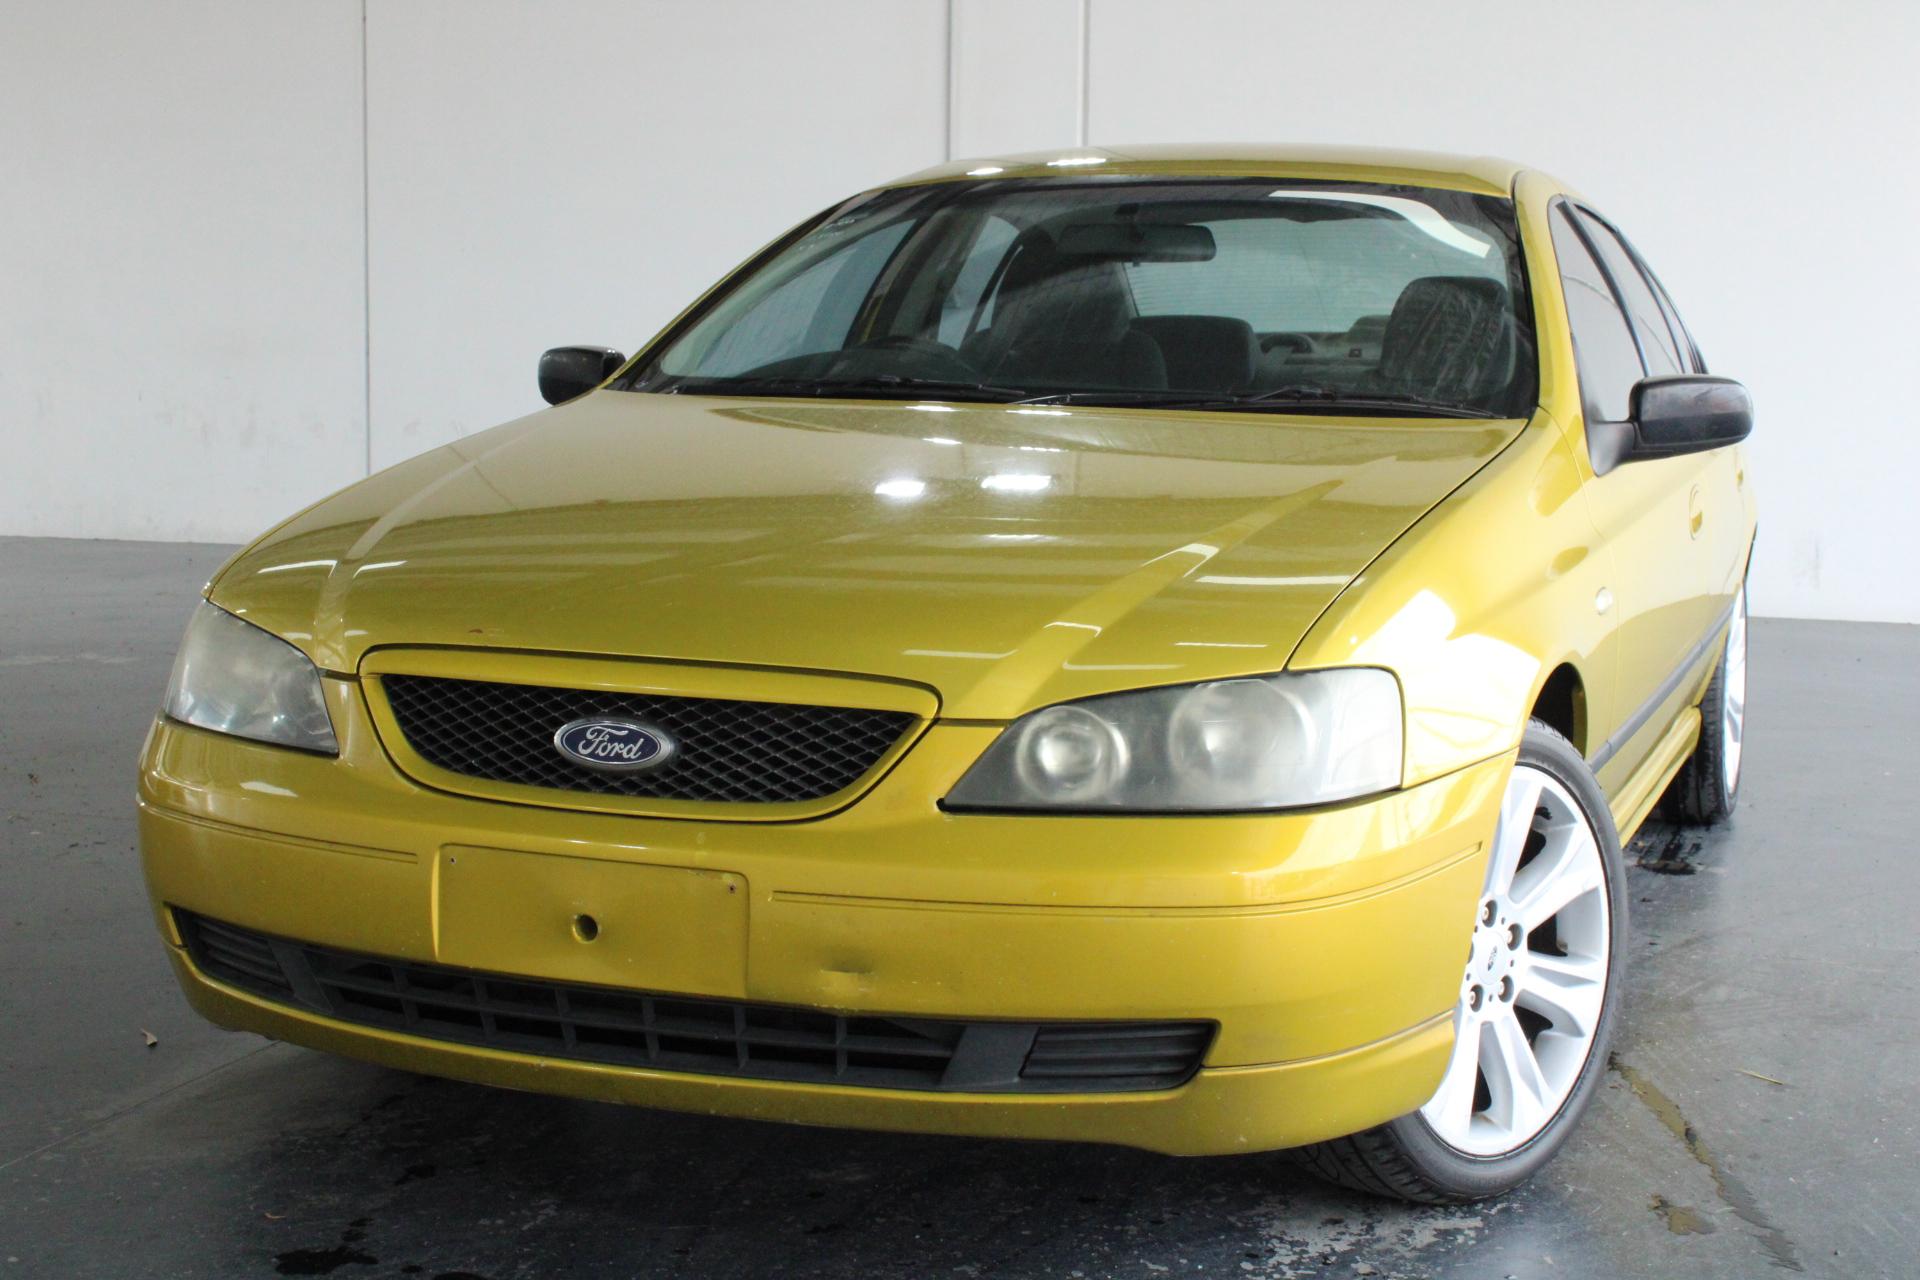 2002 Ford Falcon Futura Automatic Sedan